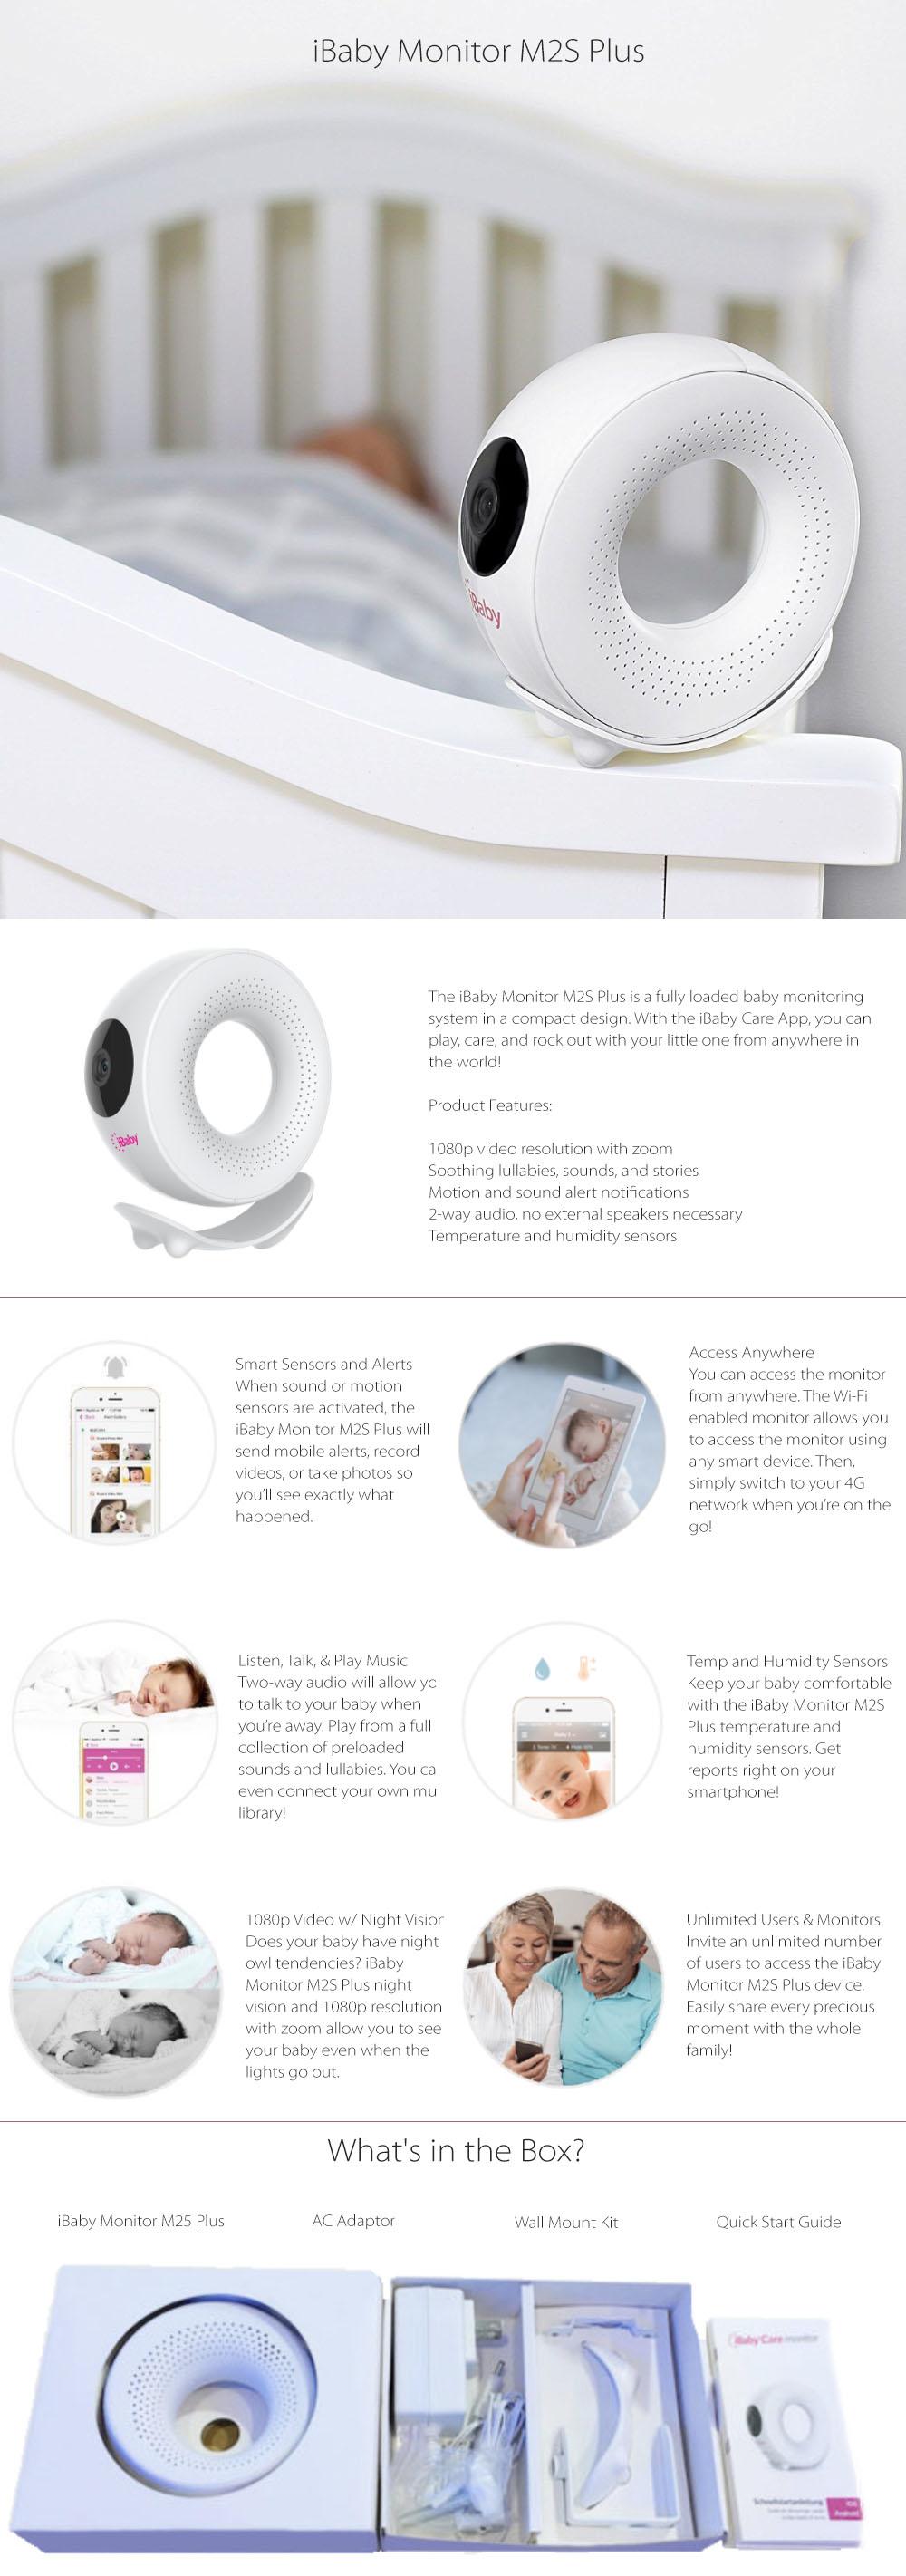 iBaby Monitor M2S Plus New Design